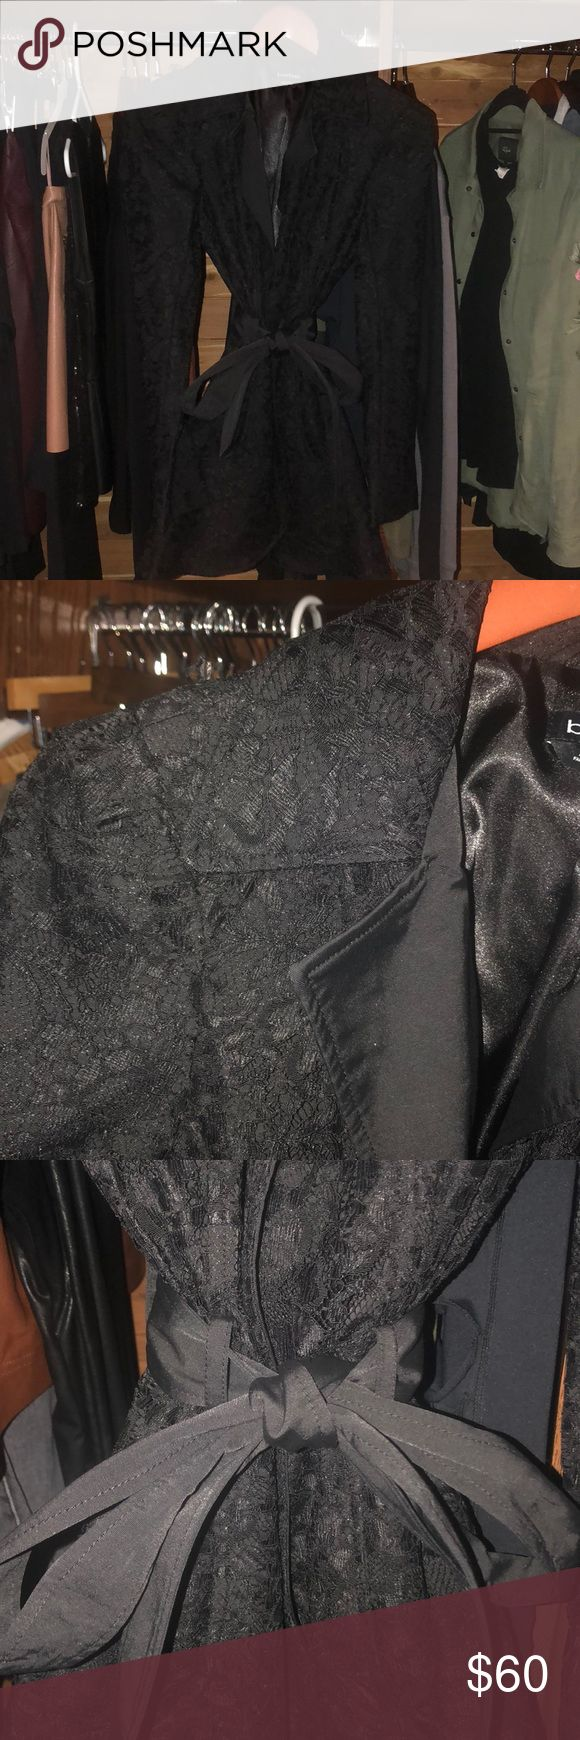 Black Pea Coat Black Bebe Pea coat. This coat is sooo adorable! Sheek or casual. Perfect for work or going out. Bebe Jackets & Coats Pea Coats